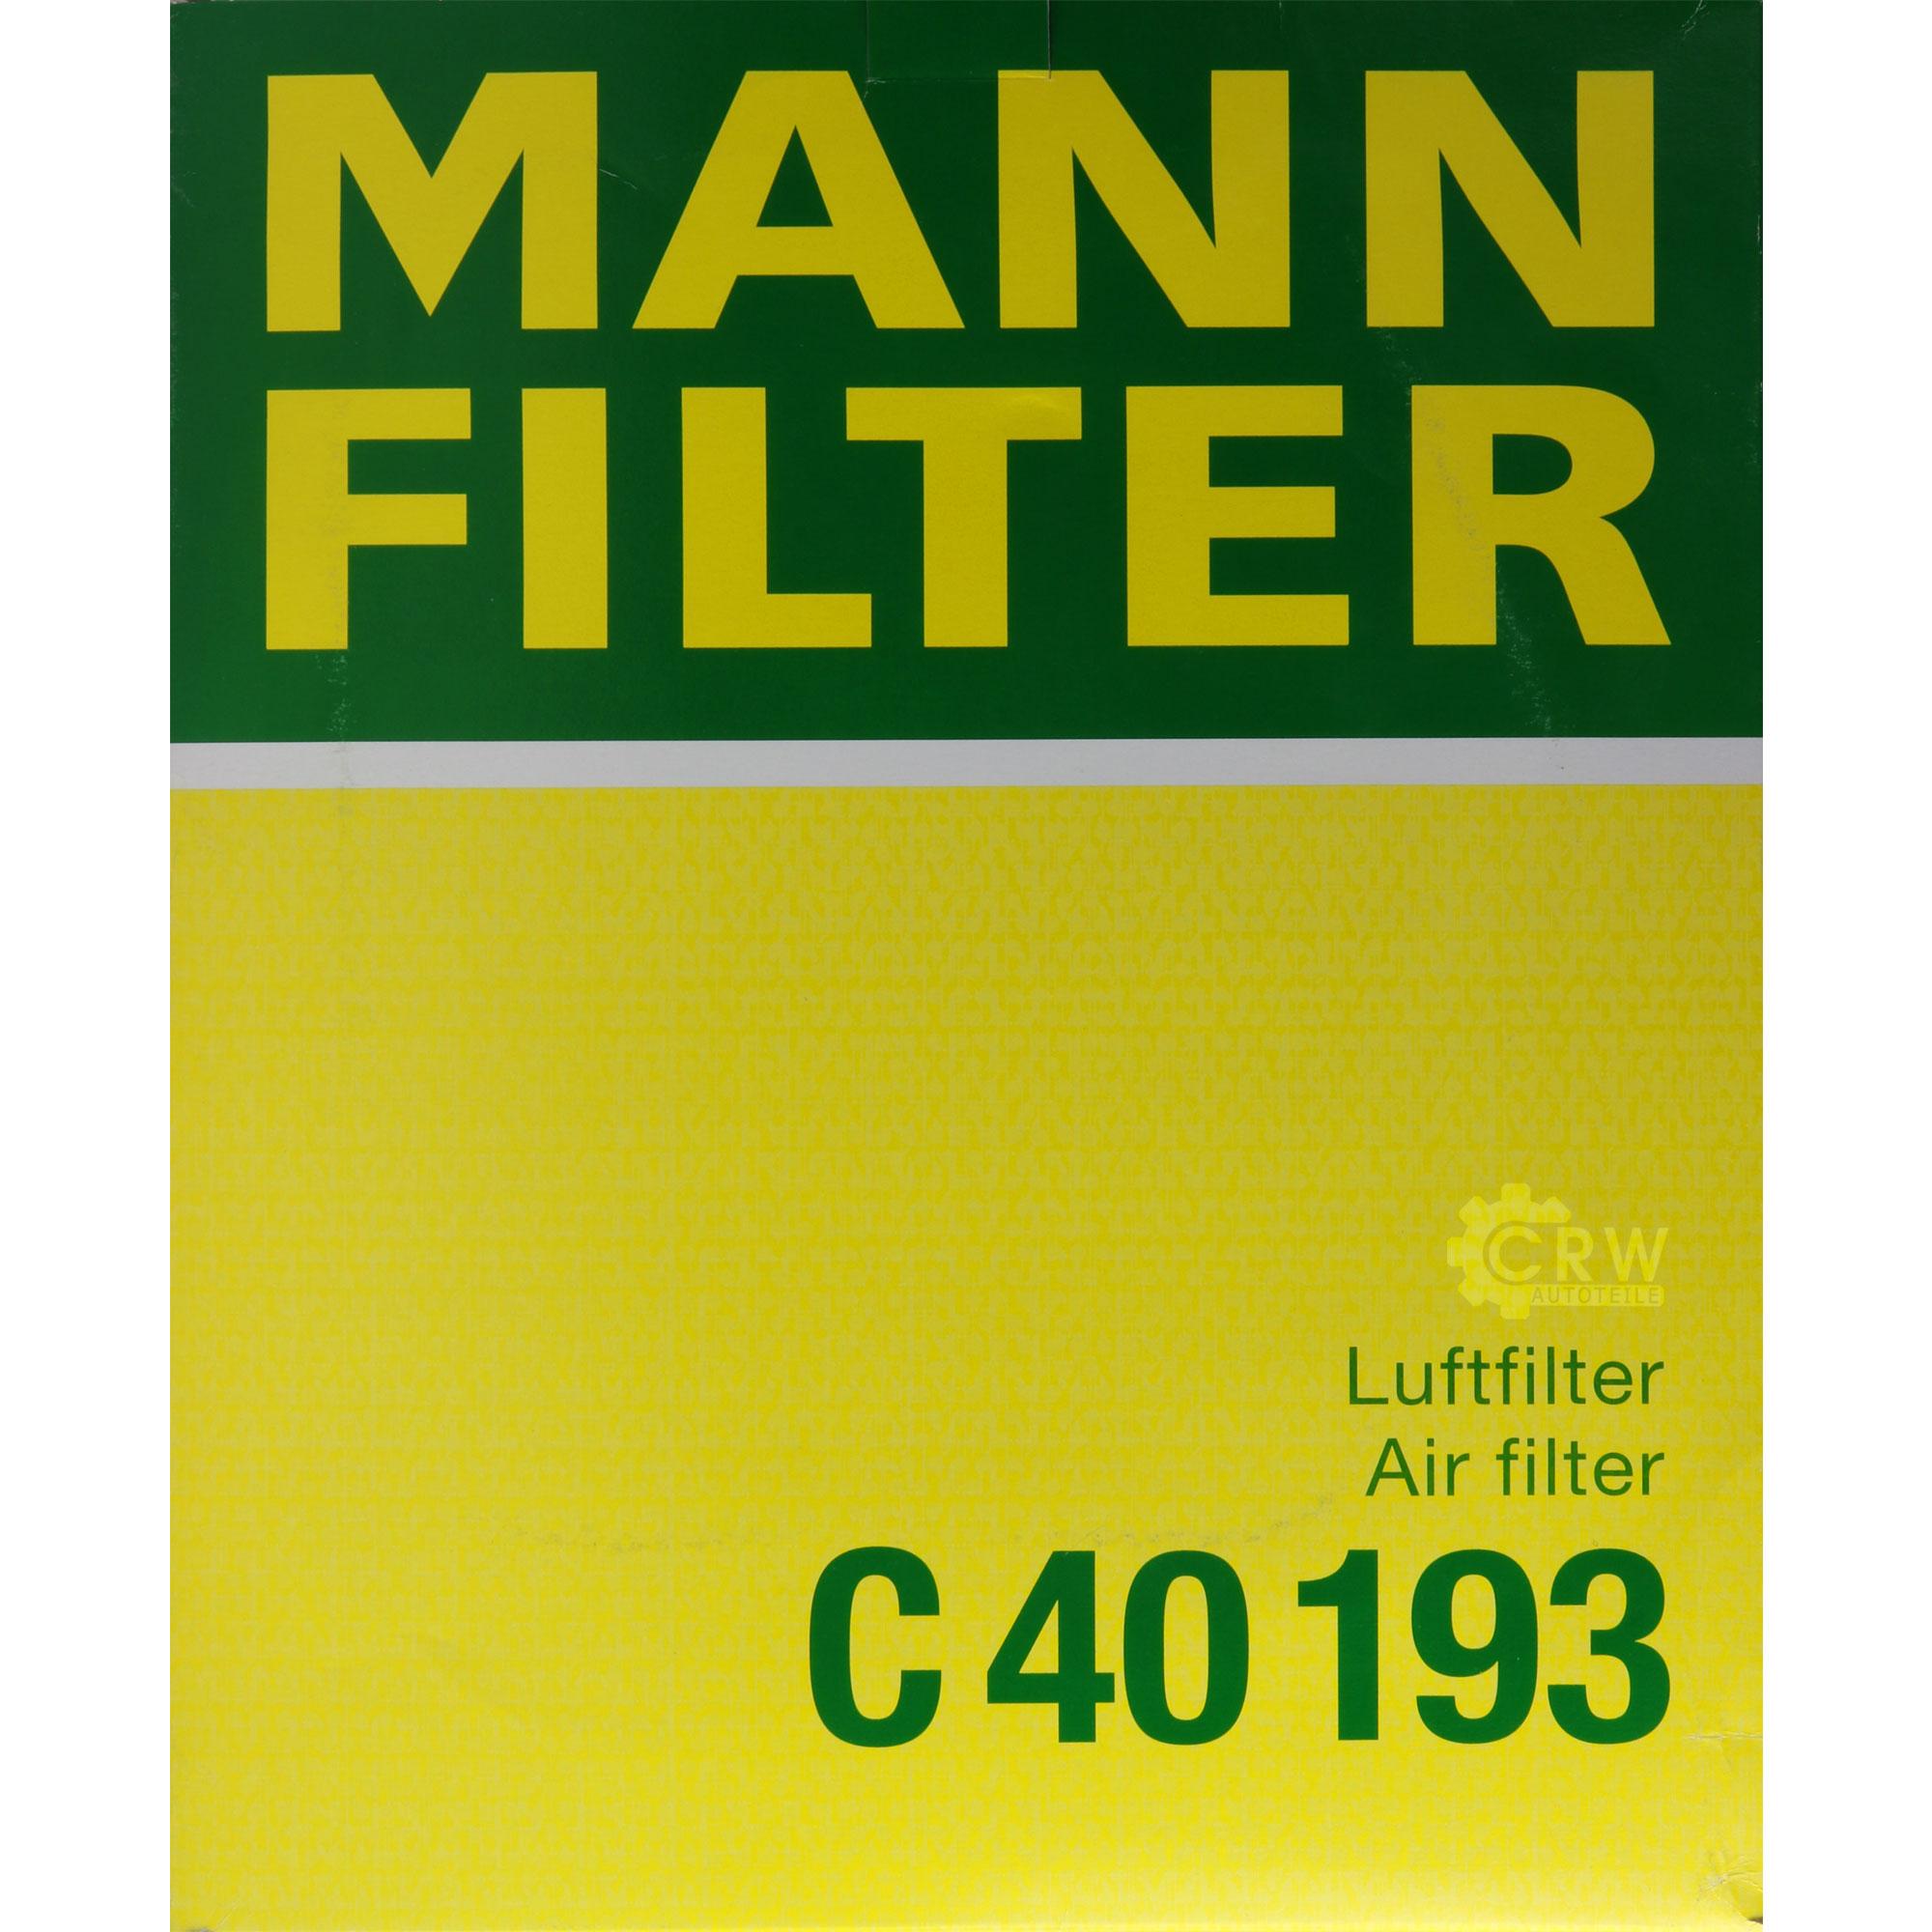 Motor-Ol-8L-MANNOL-Classic-10W-40-MANN-FILTER-Mercedes-Benz-Stufenheck-W124 Indexbild 11